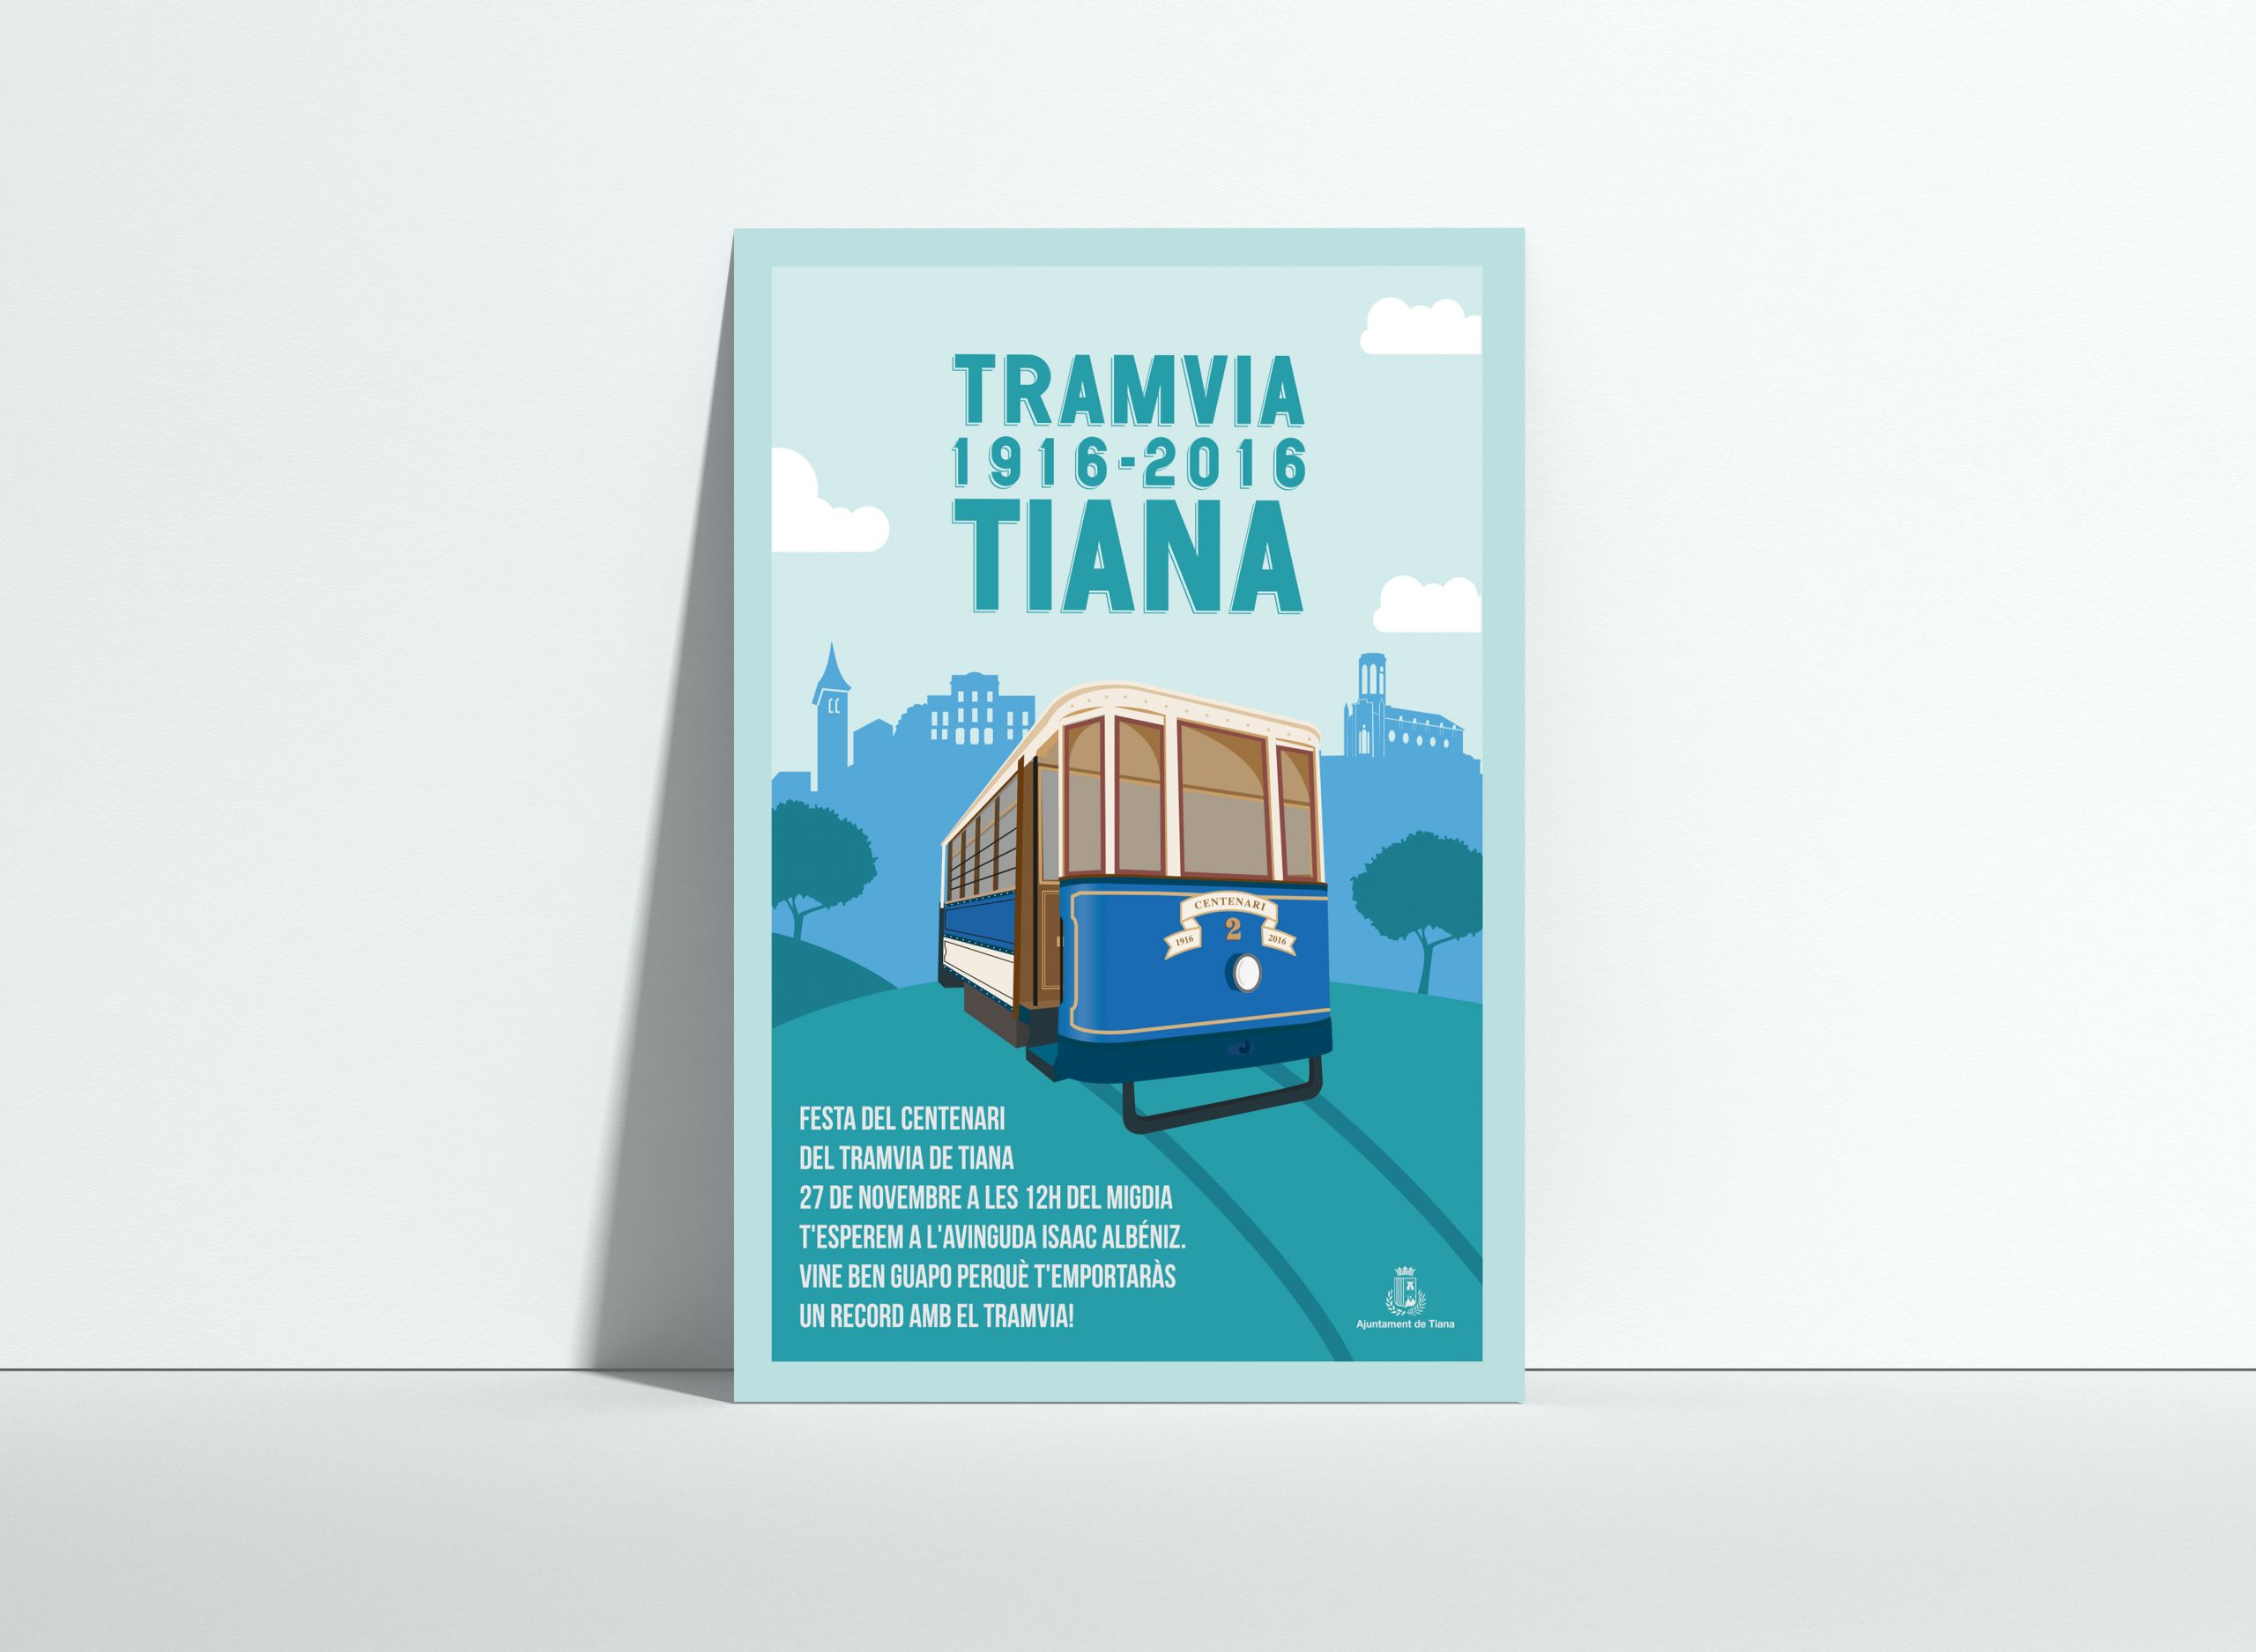 Tramvia de Tiana